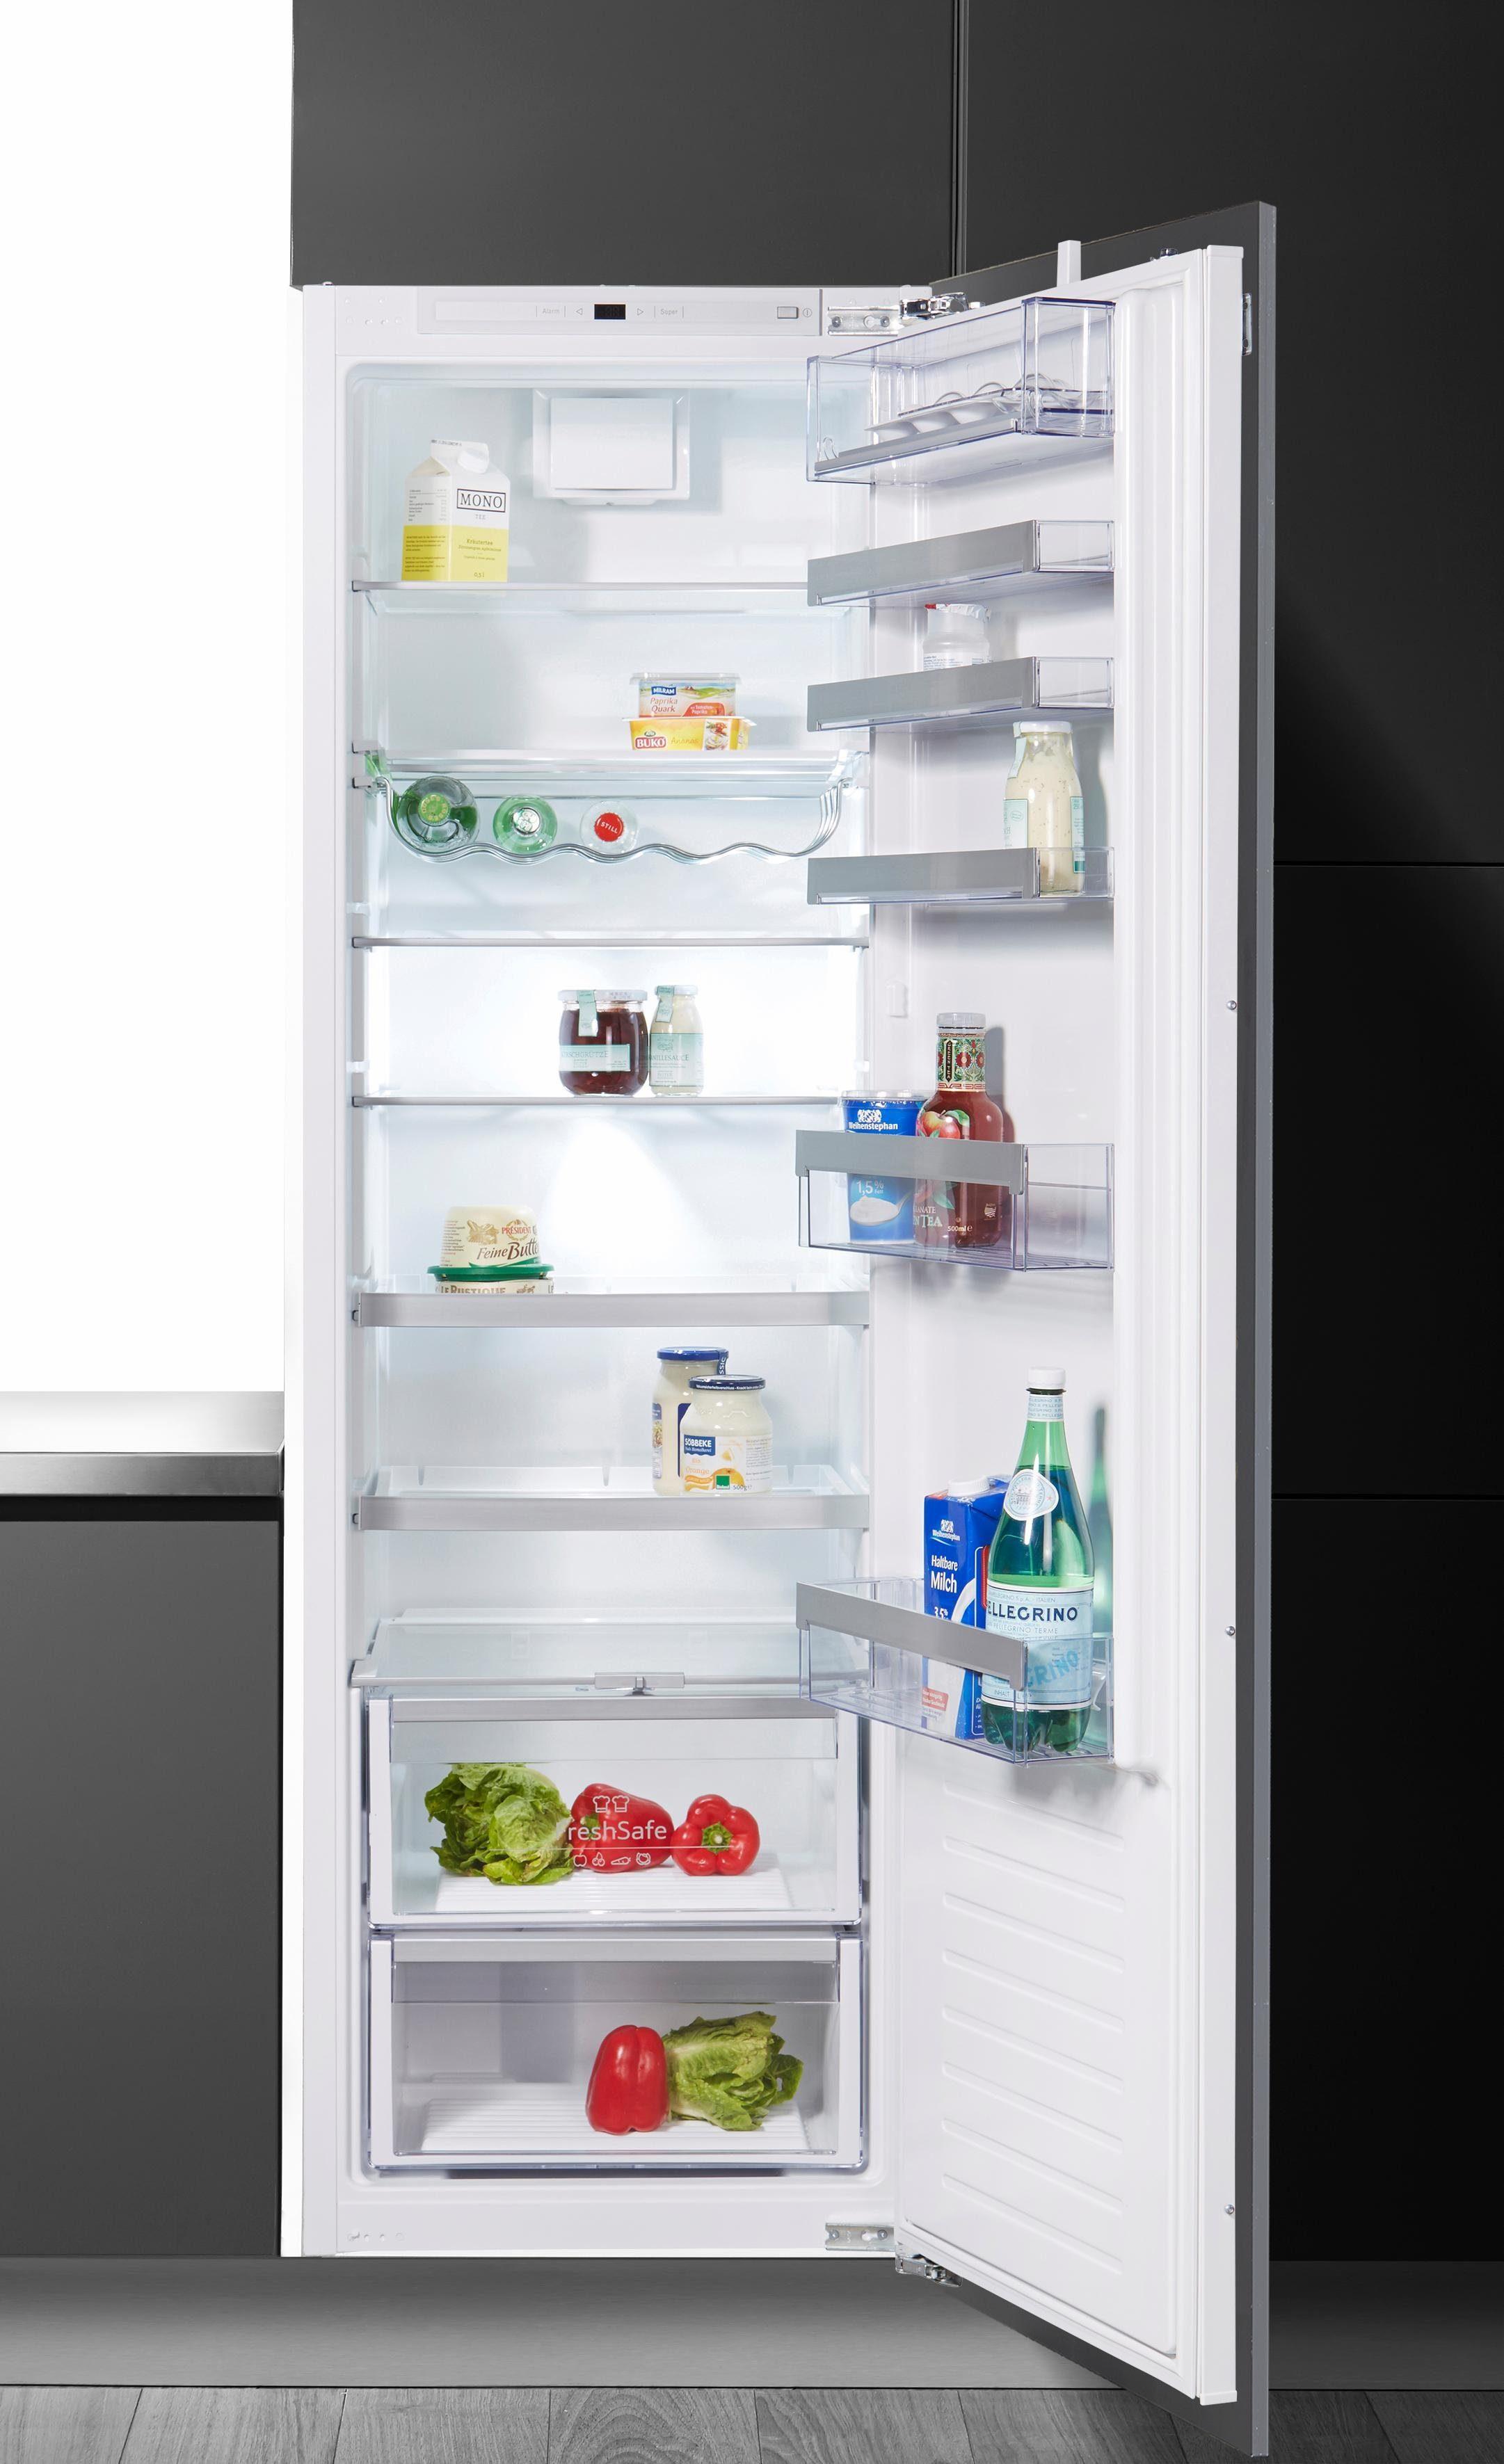 NEFF Einbaukühlschrank K835A2 / KI2822F30, 177,2 cm hoch, 55,8 cm breit, integrierbar